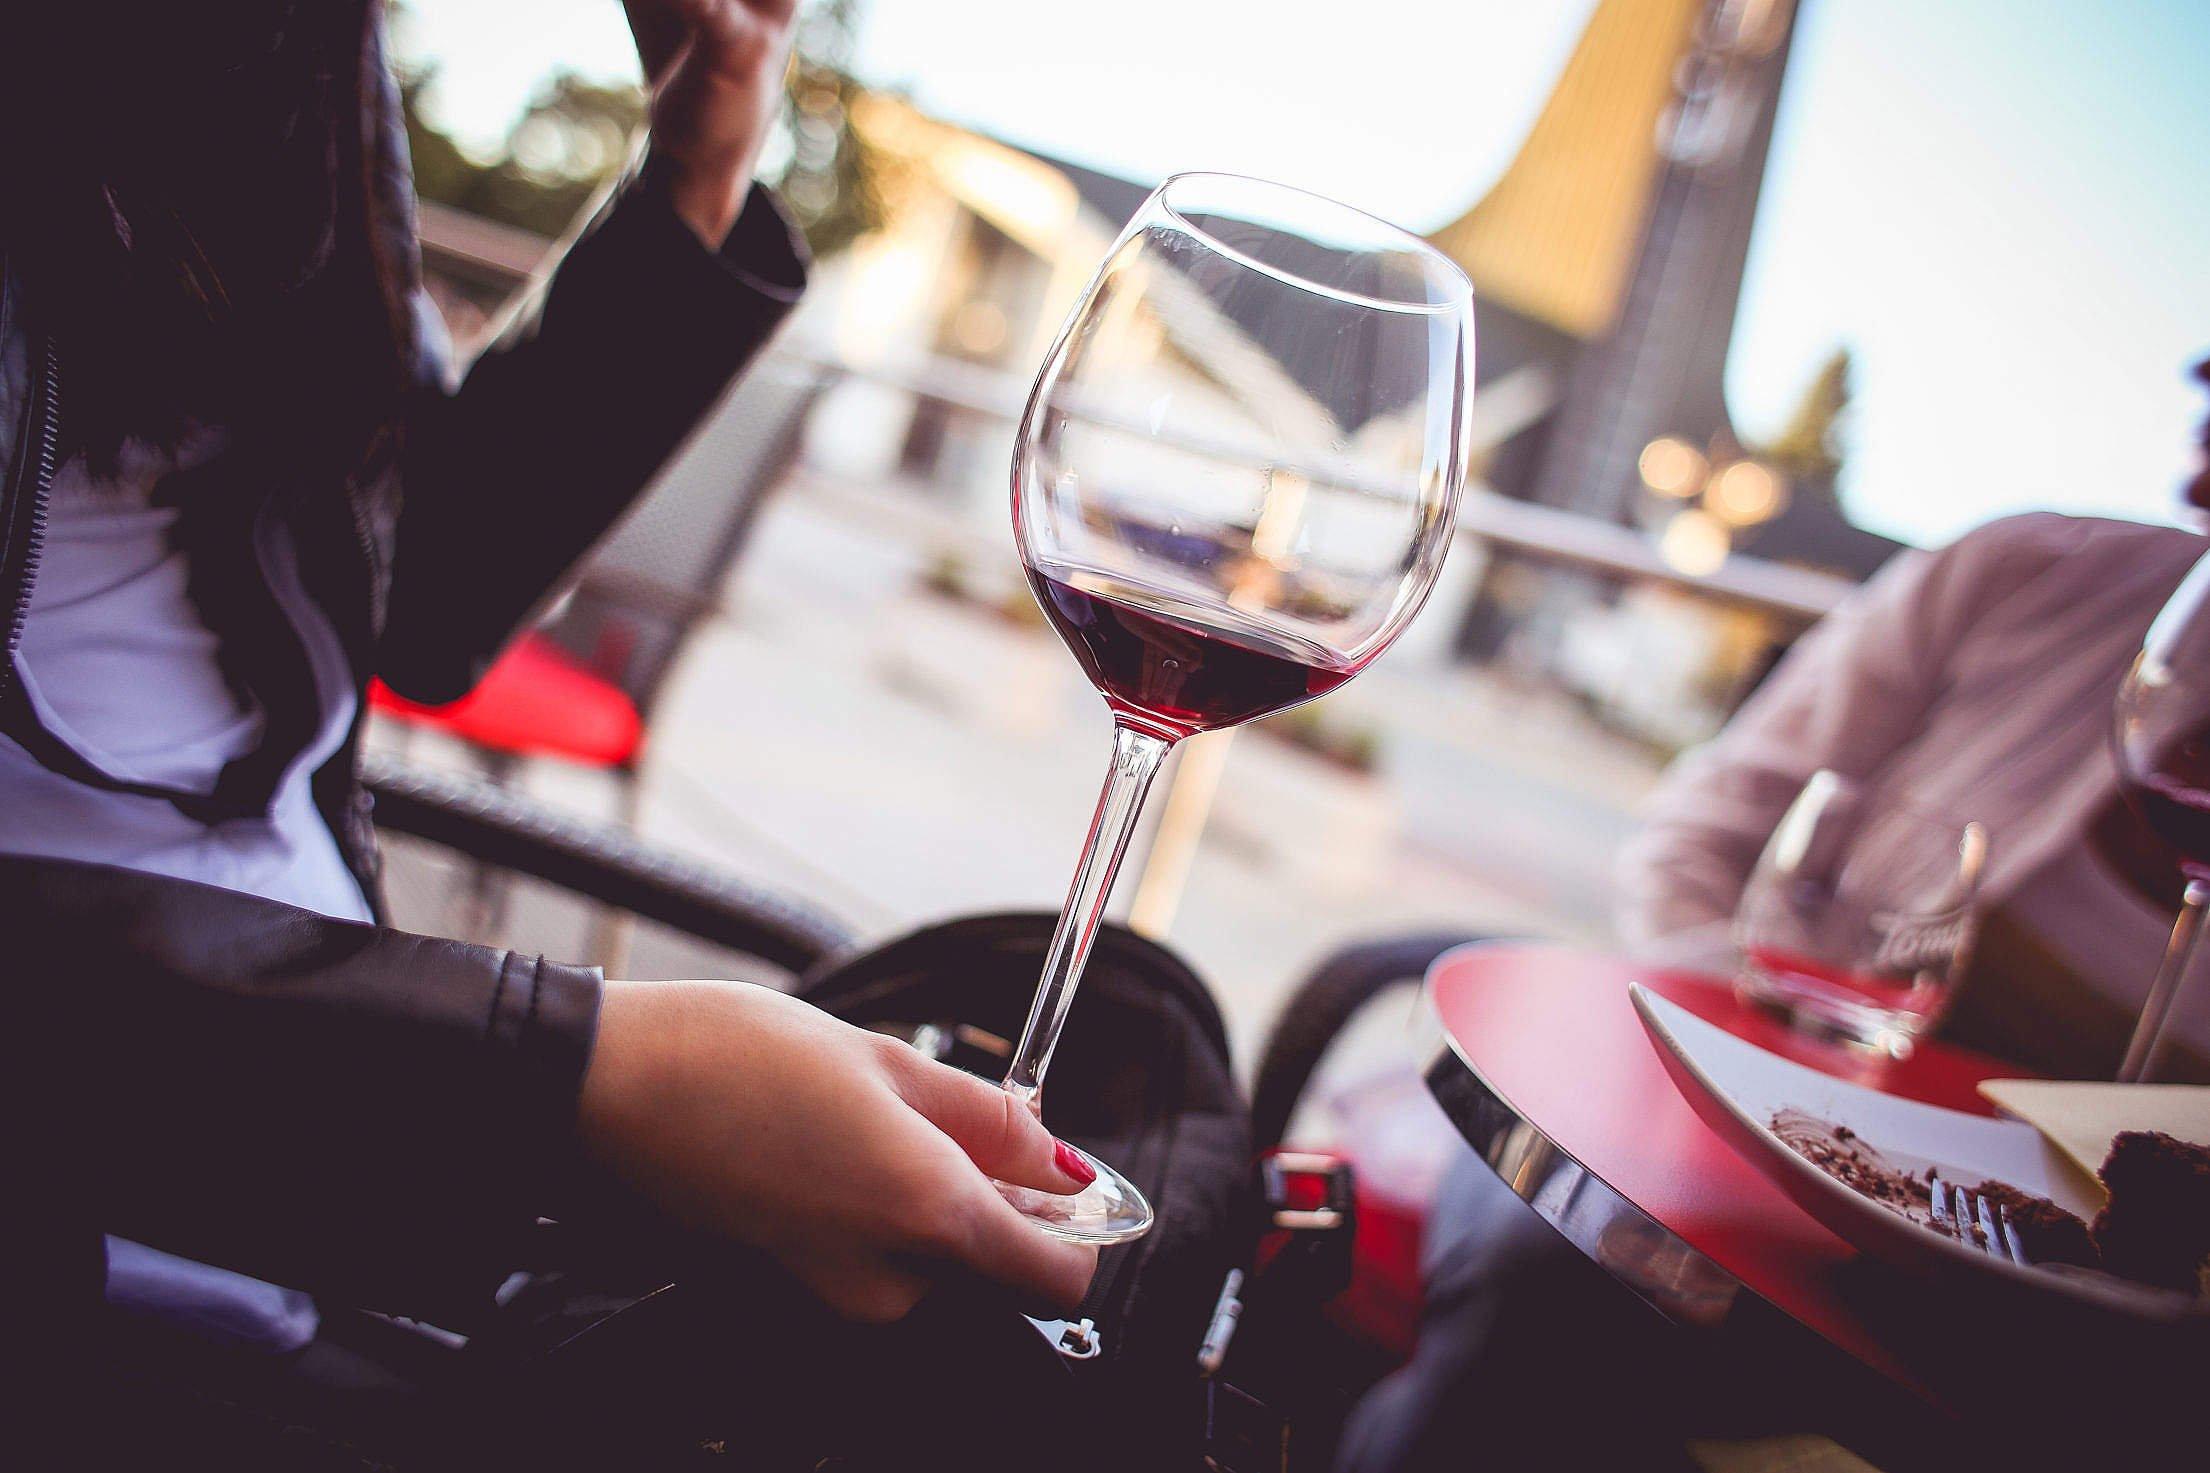 фотки с вином на аву сосисками